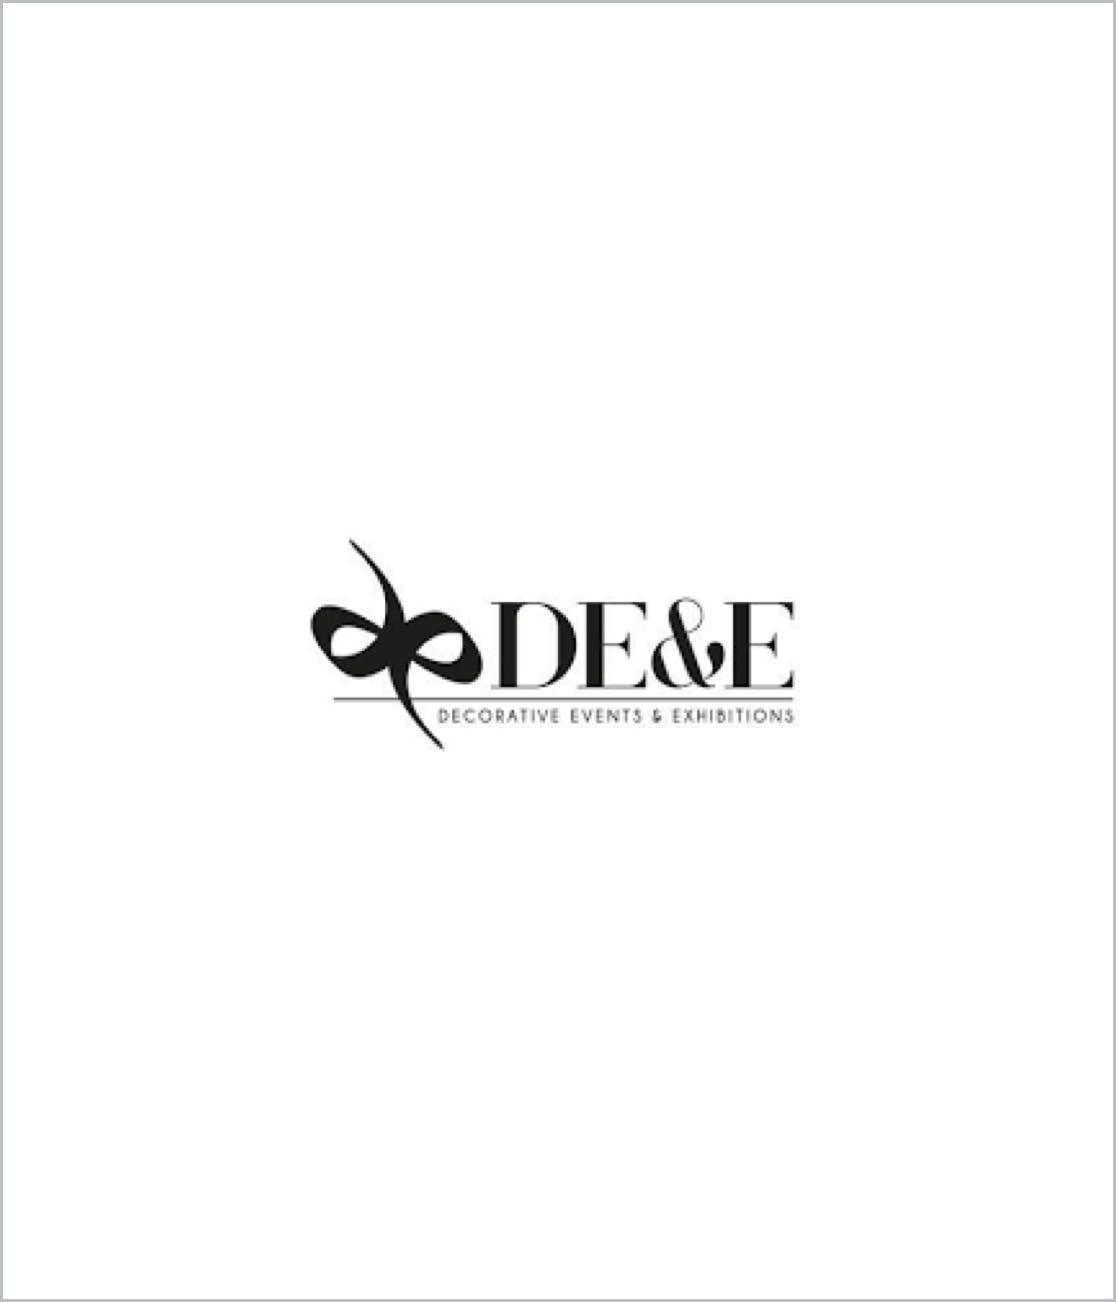 Deande Logo Supplier